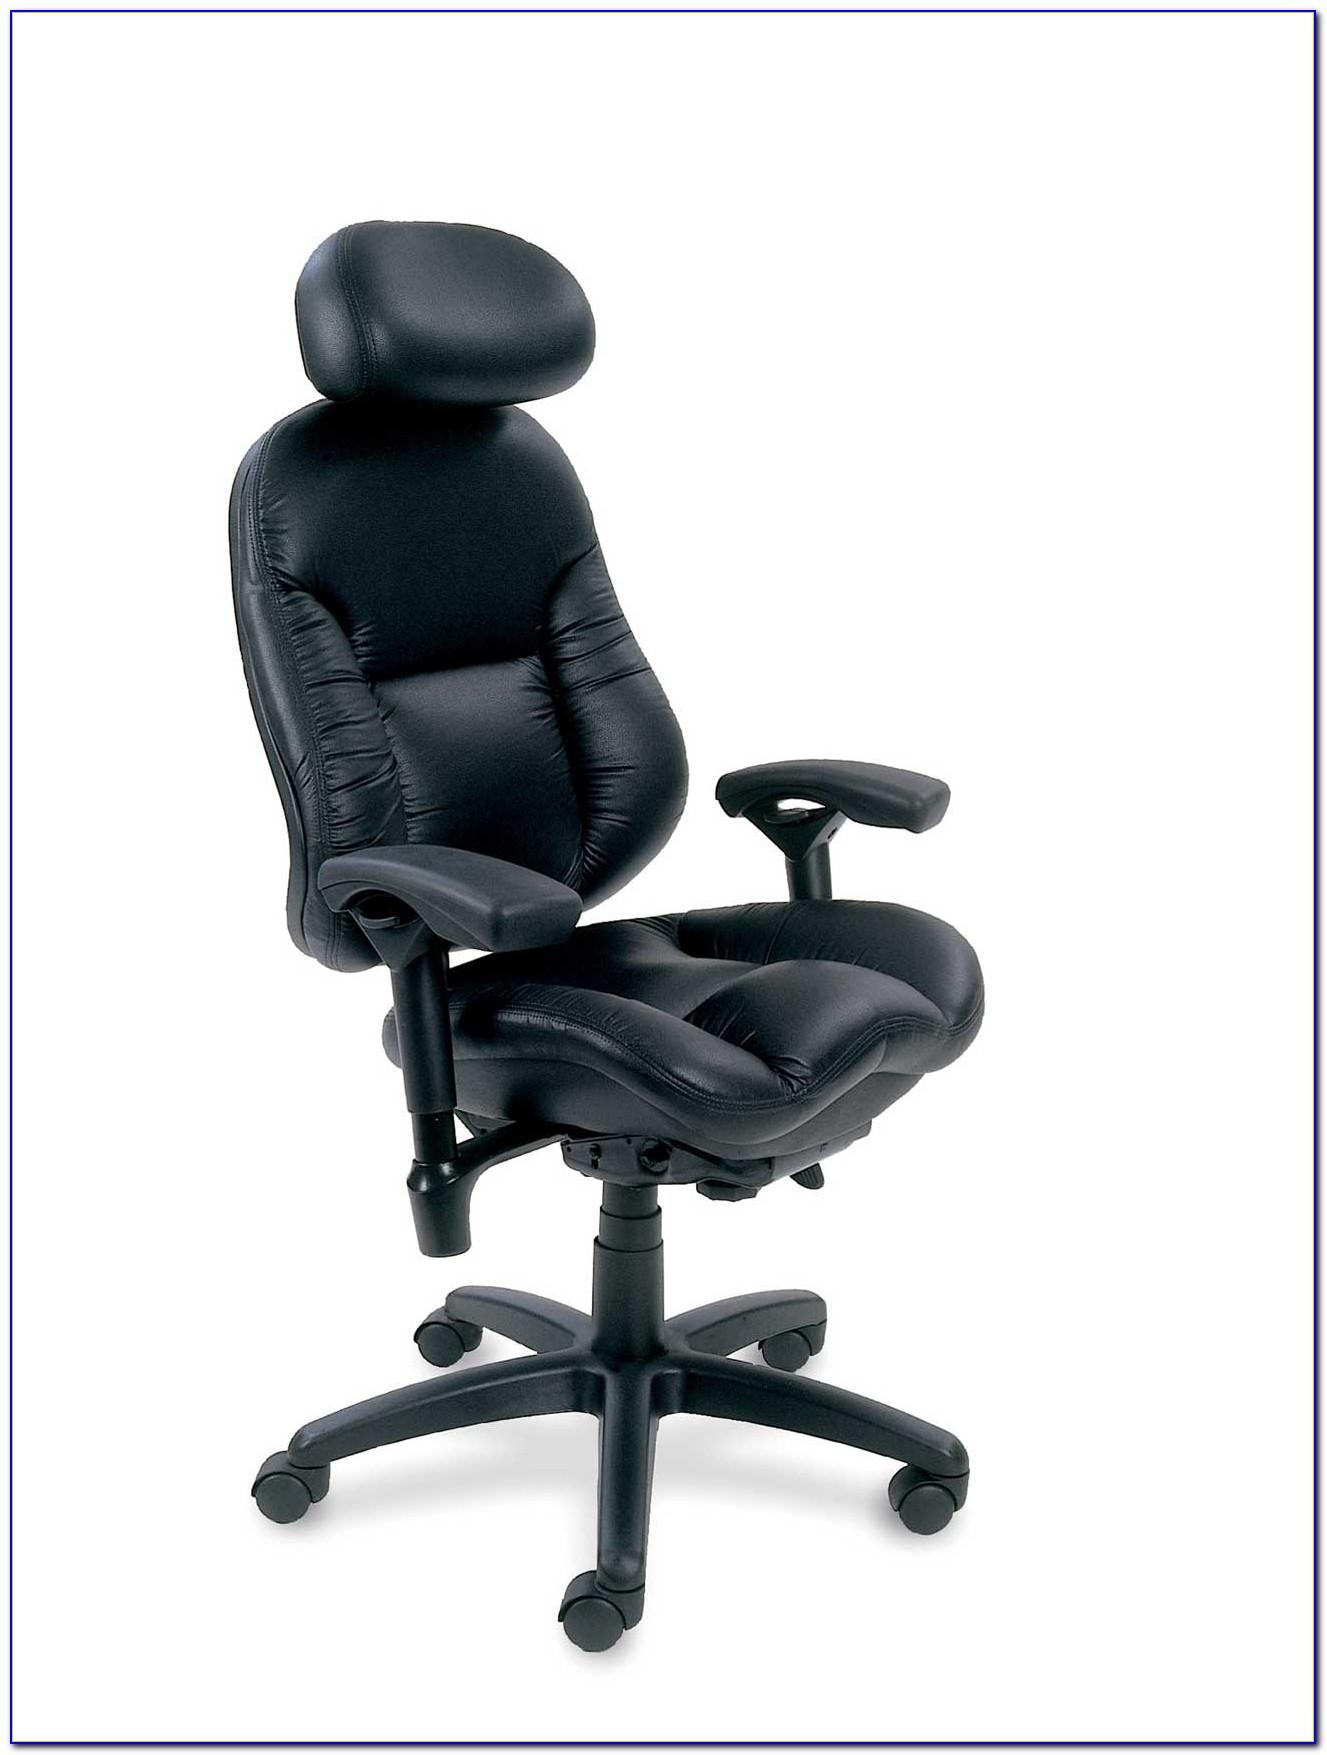 Ergonomic Computer Desk And Chair